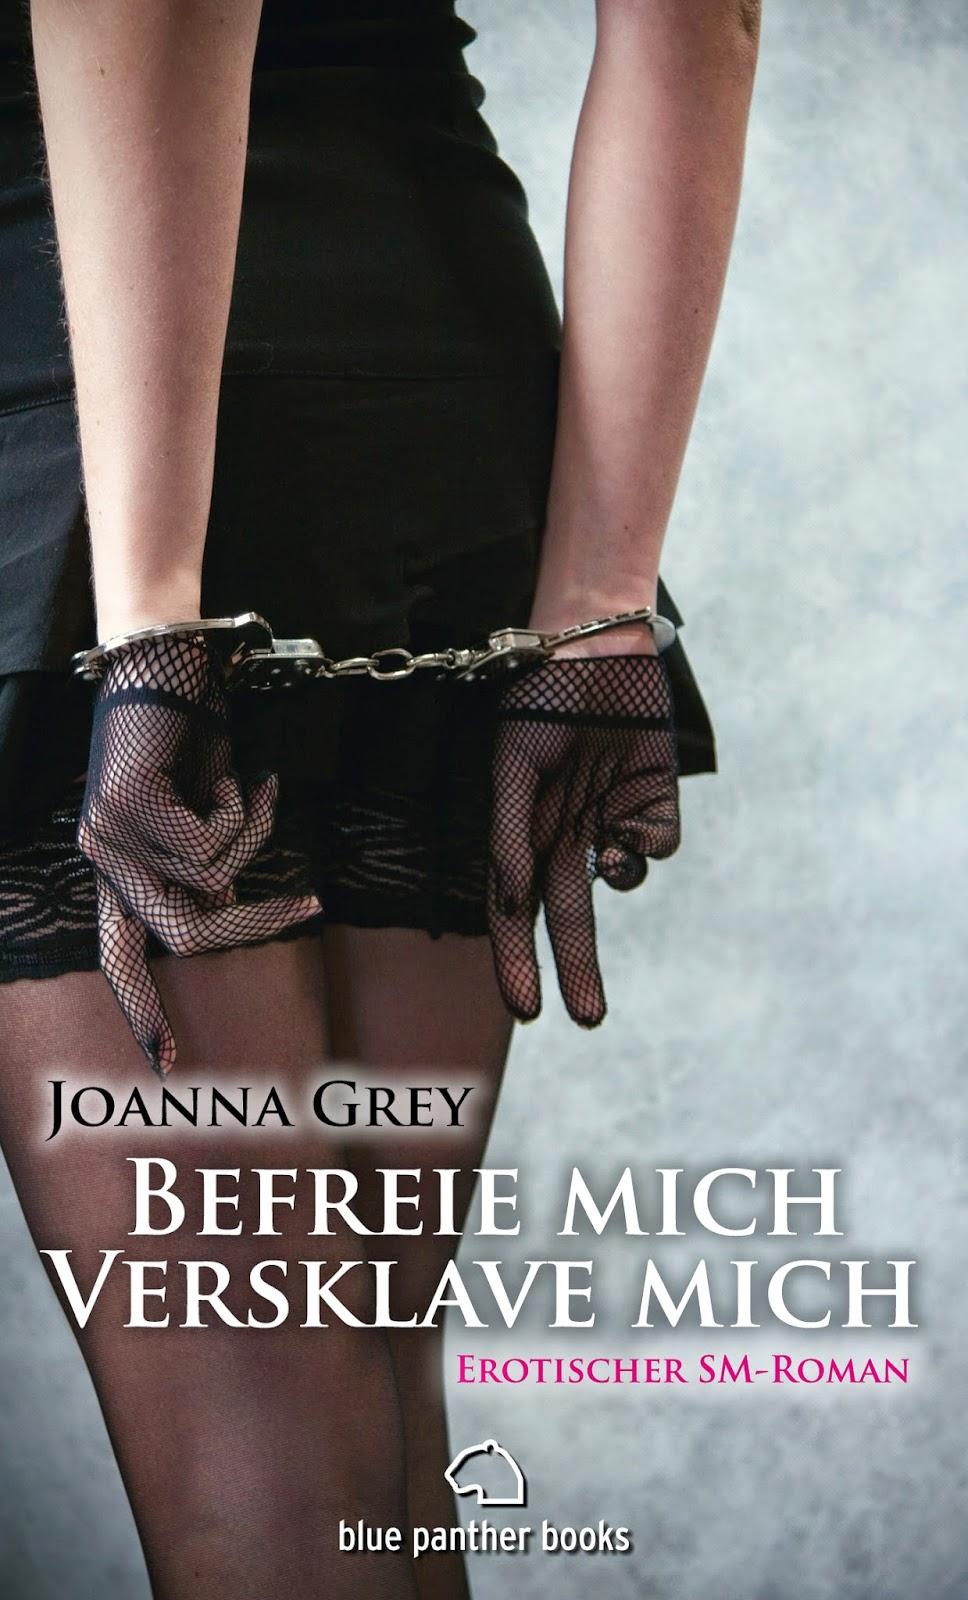 http://www.blue-panther-books.de/de/leseprobehtml/leseprobe-jg1html/news/befreie-mich-versklave-mich-erotischer-sm-roman.html